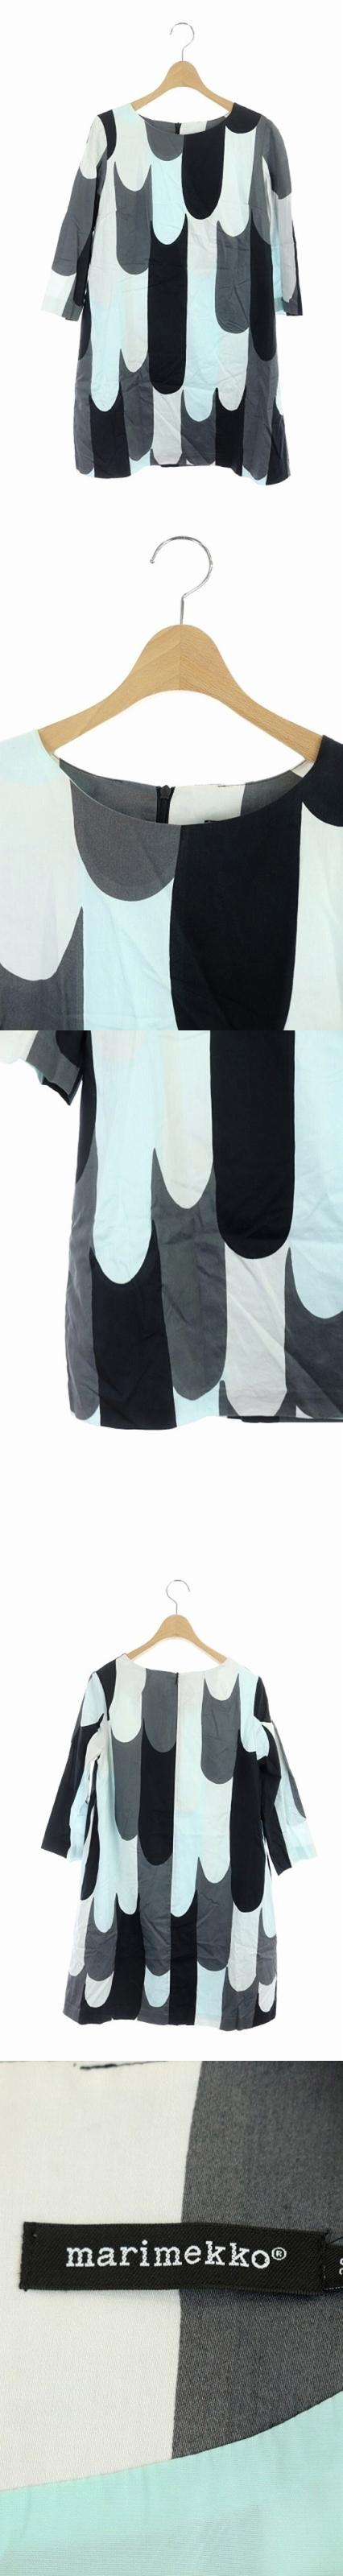 RITARI MINNE ワンピース 七分袖 ひざ丈 総柄 36 グレー 黒 水色 /MN ■OS